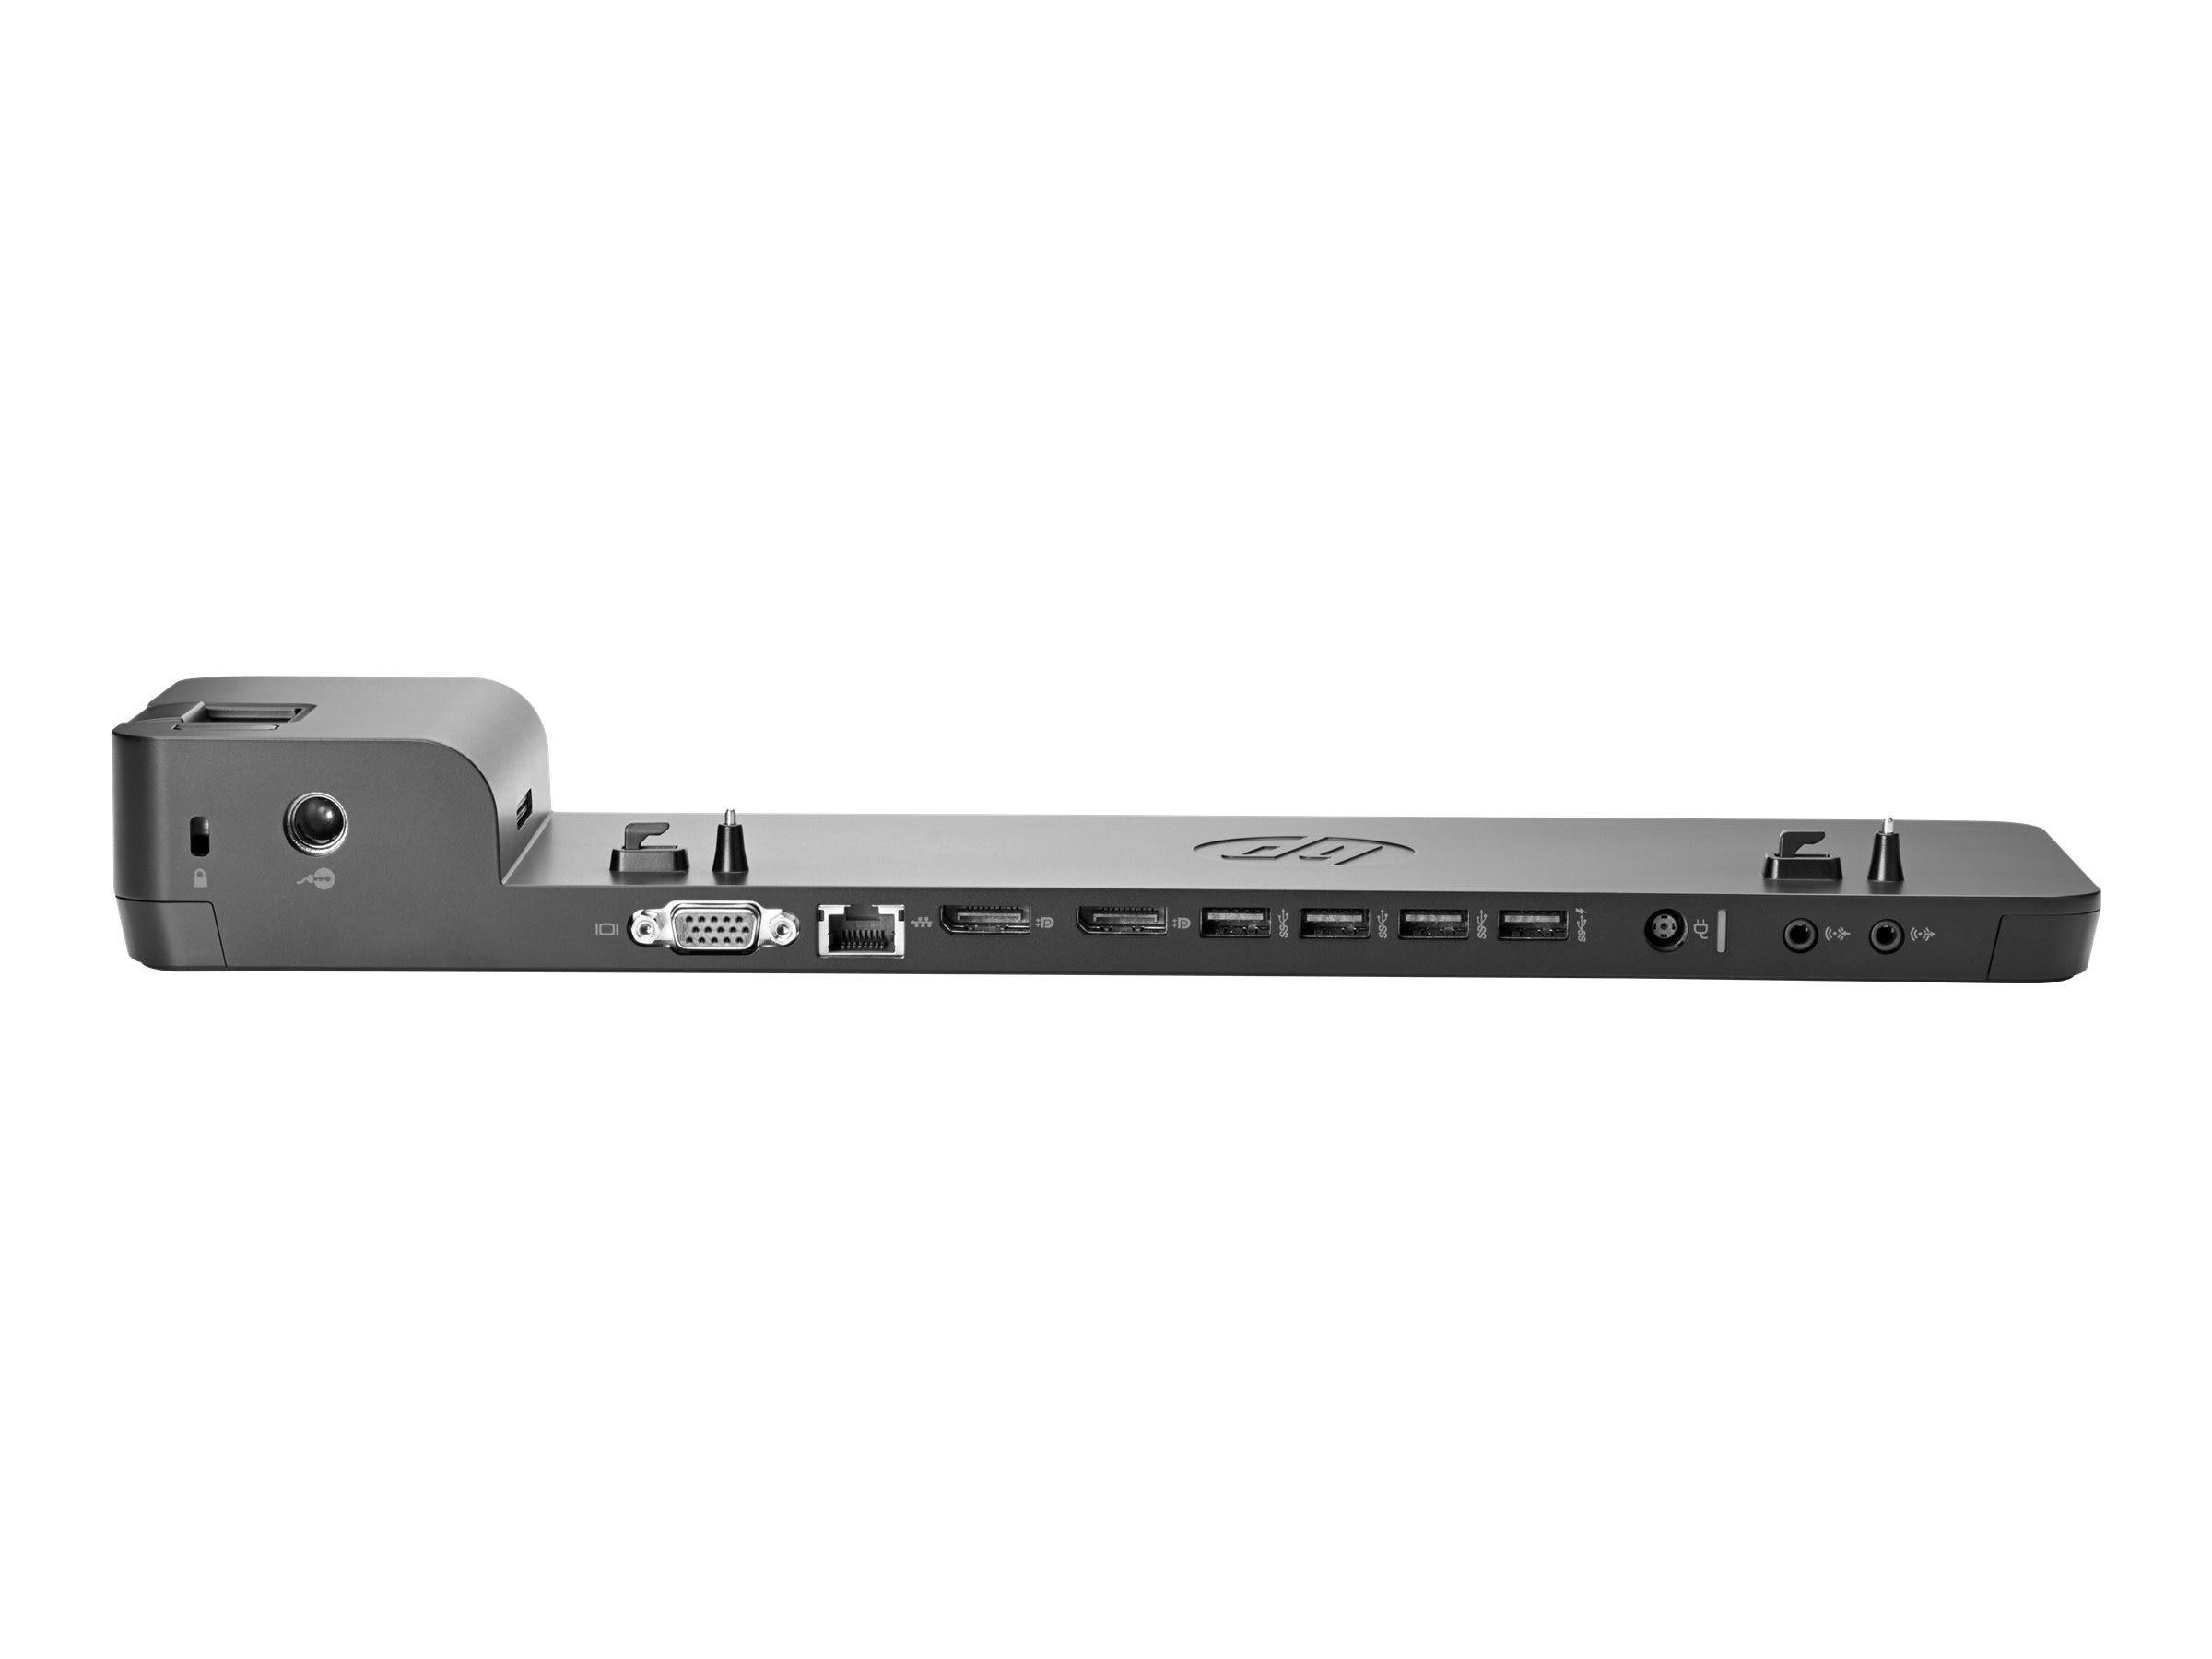 HP 2013 UltraSlim Dock